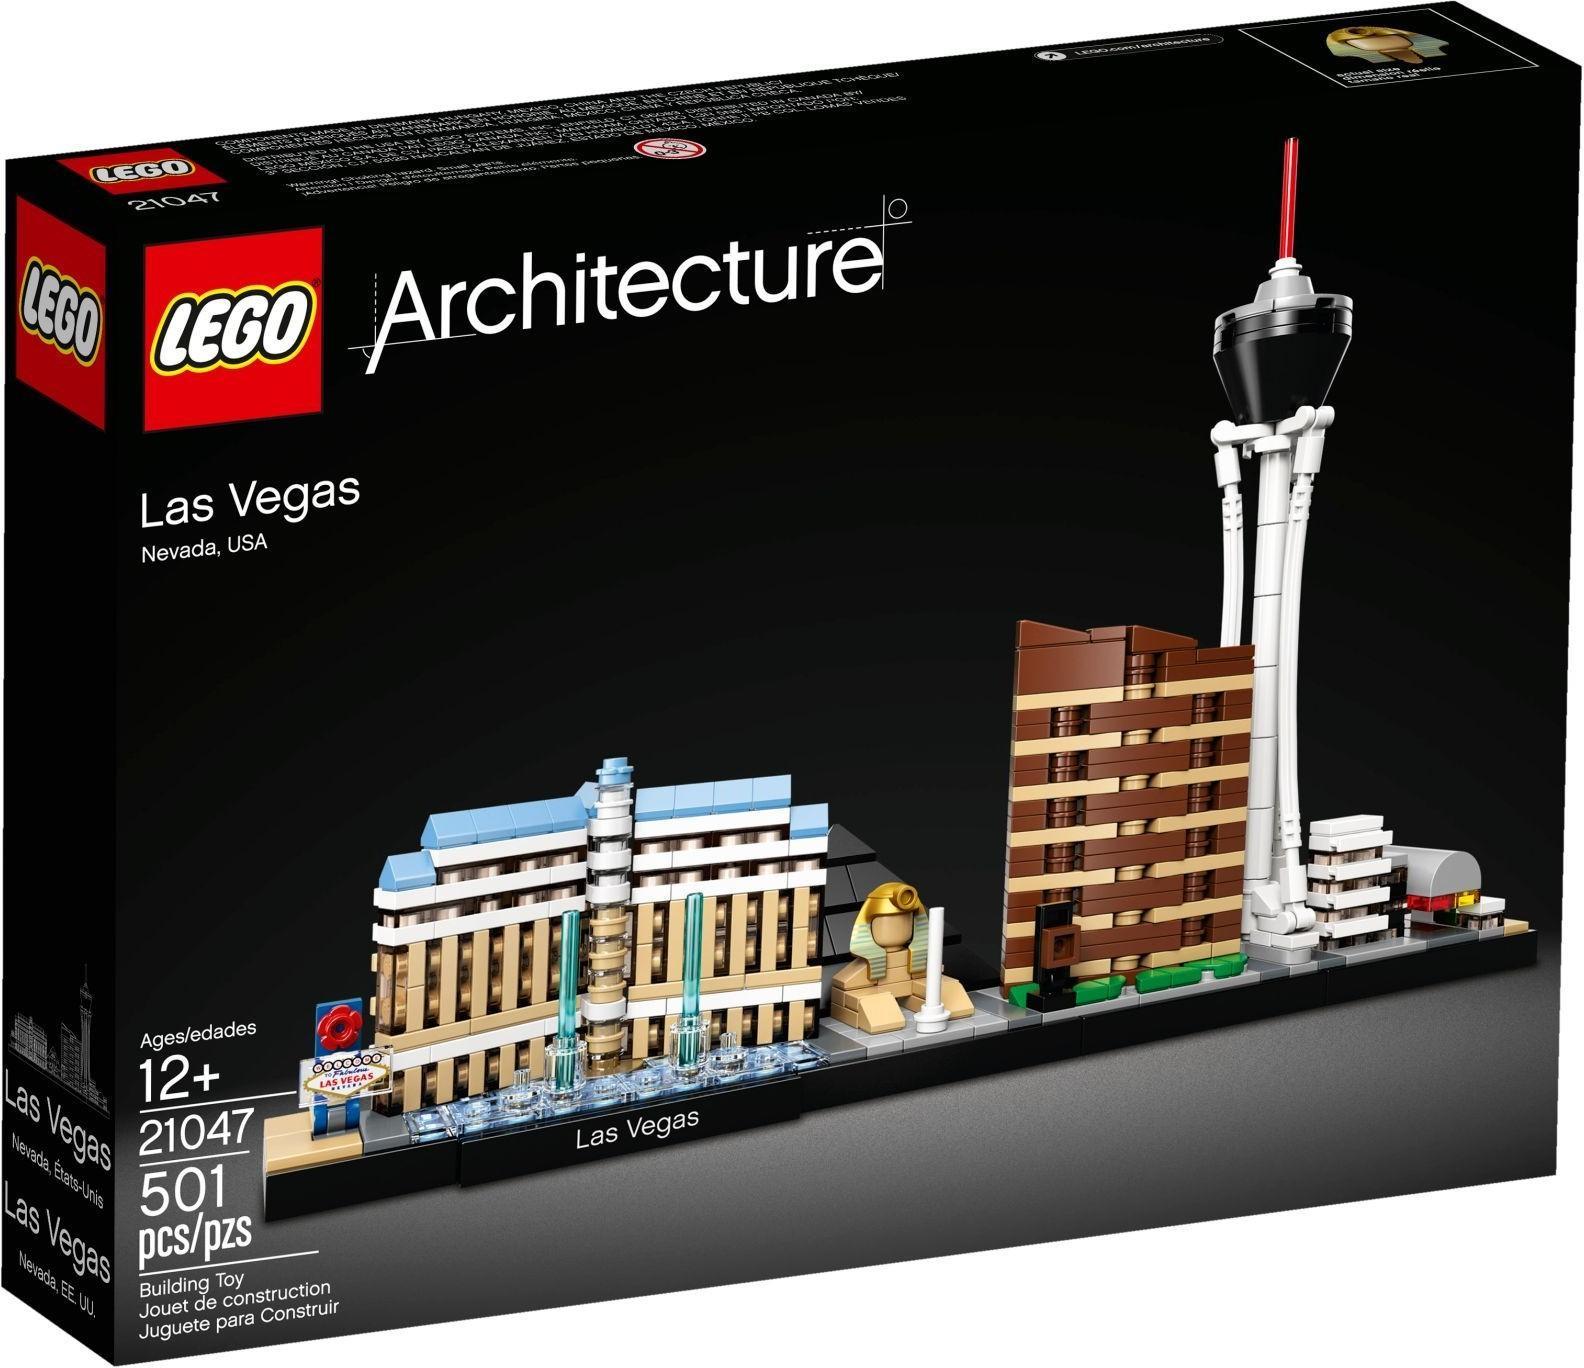 Lego® Las Vegas Magic Architecture Jouets Lego 21047 Vos Acheter IWH92ED